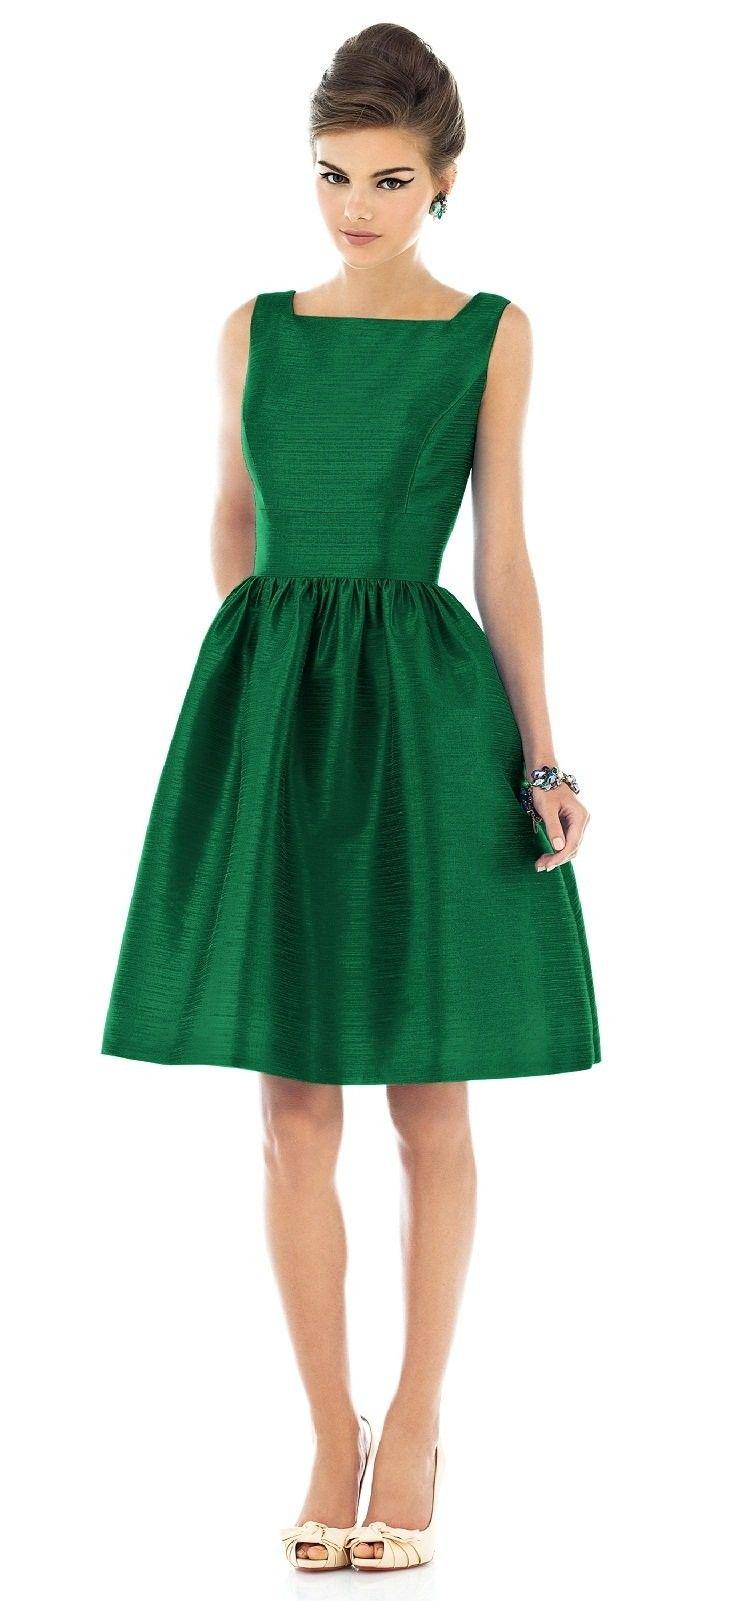 Retro Emerald Dress #Mad #Men #style #1960s